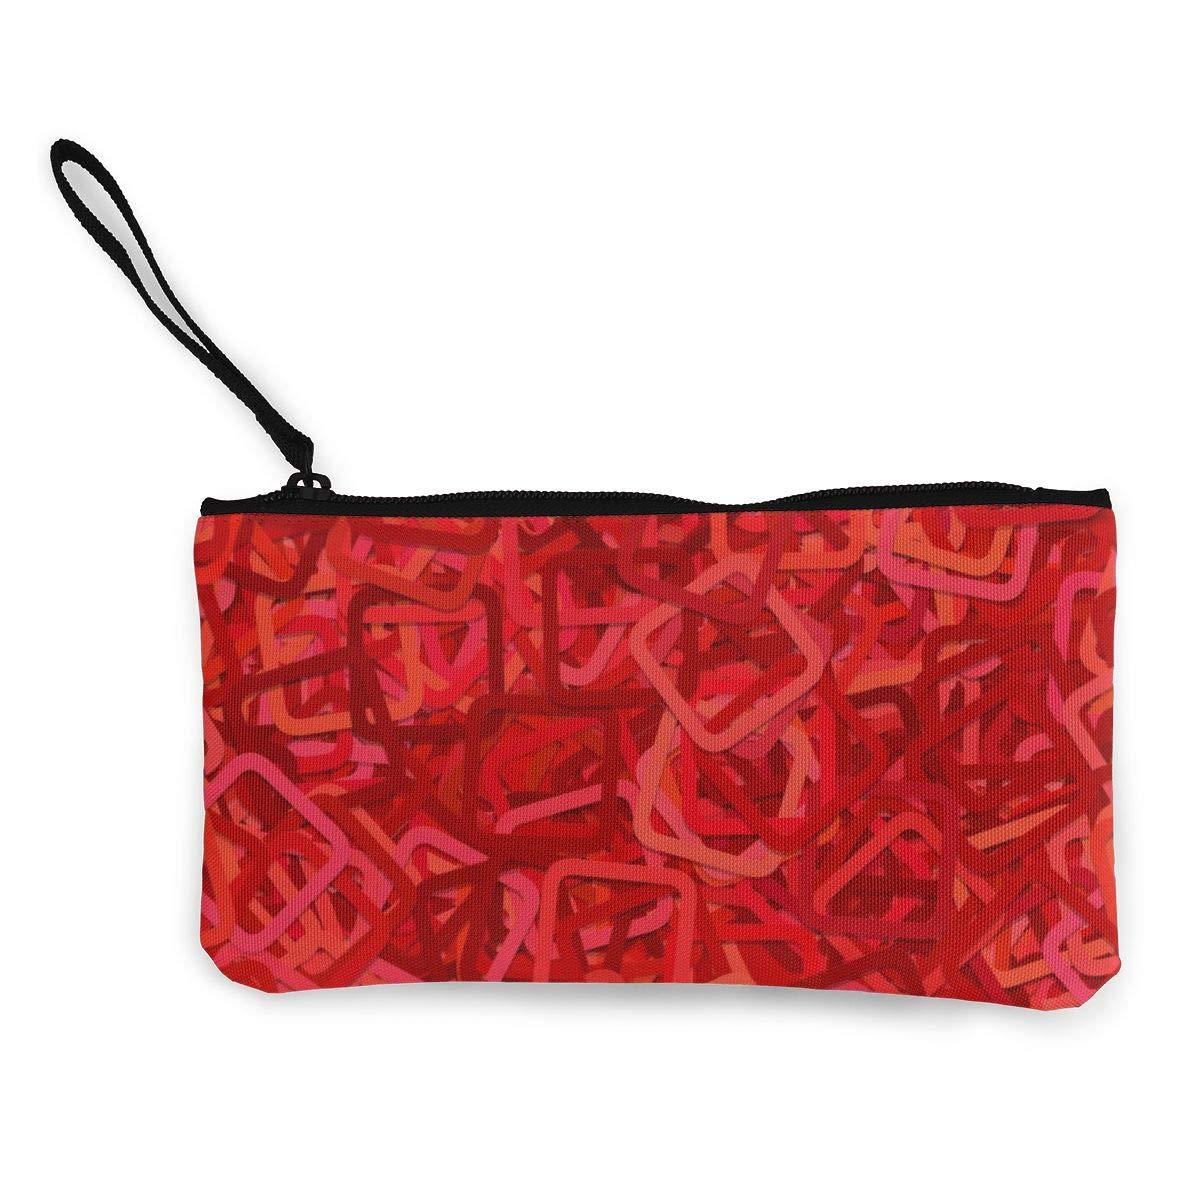 Pocket Handbag Art Print Coin Purse Makeup Bag Zip Canvas Purse Wallet